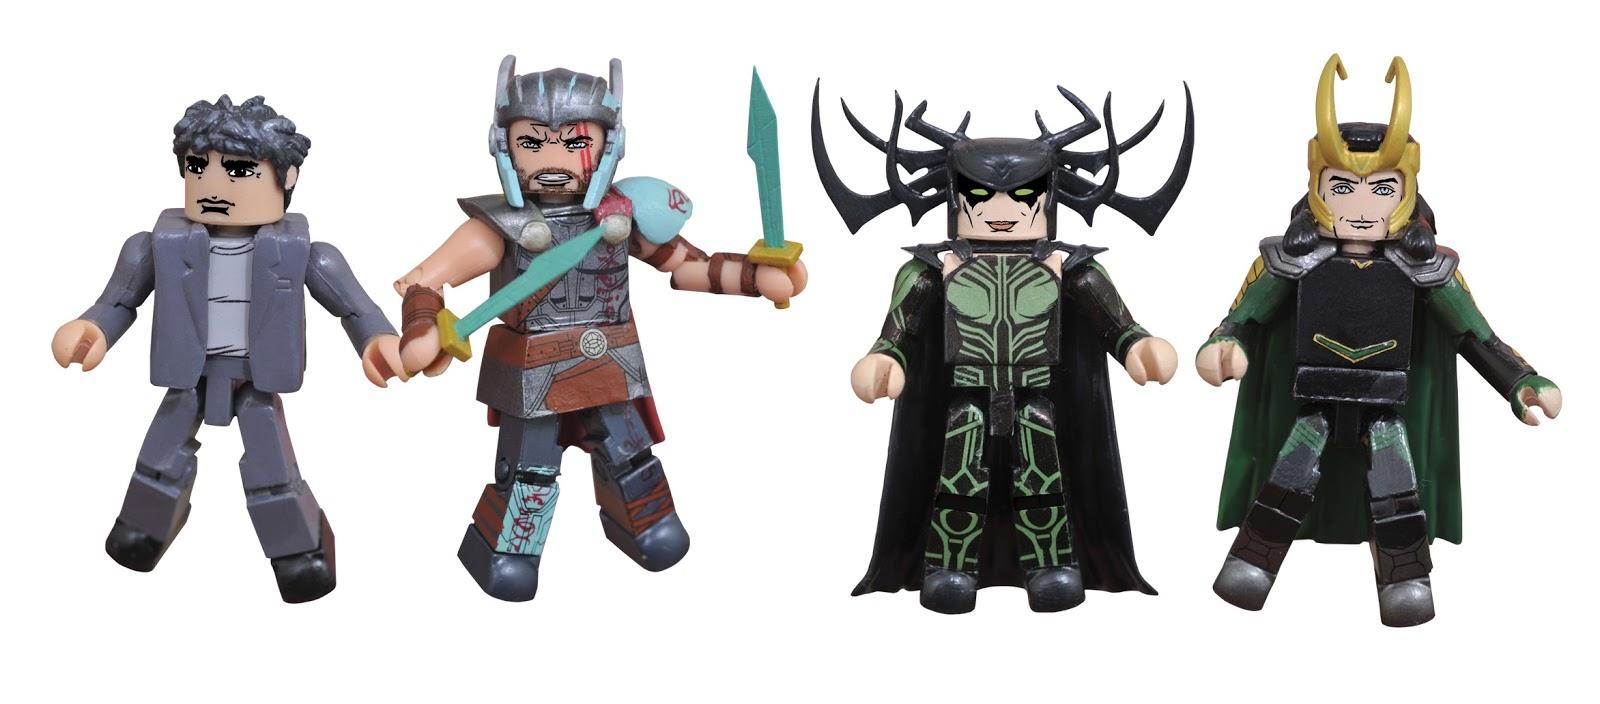 Thor: Ragnarok Marvel Minimates Box Set By Diamond Select Toys